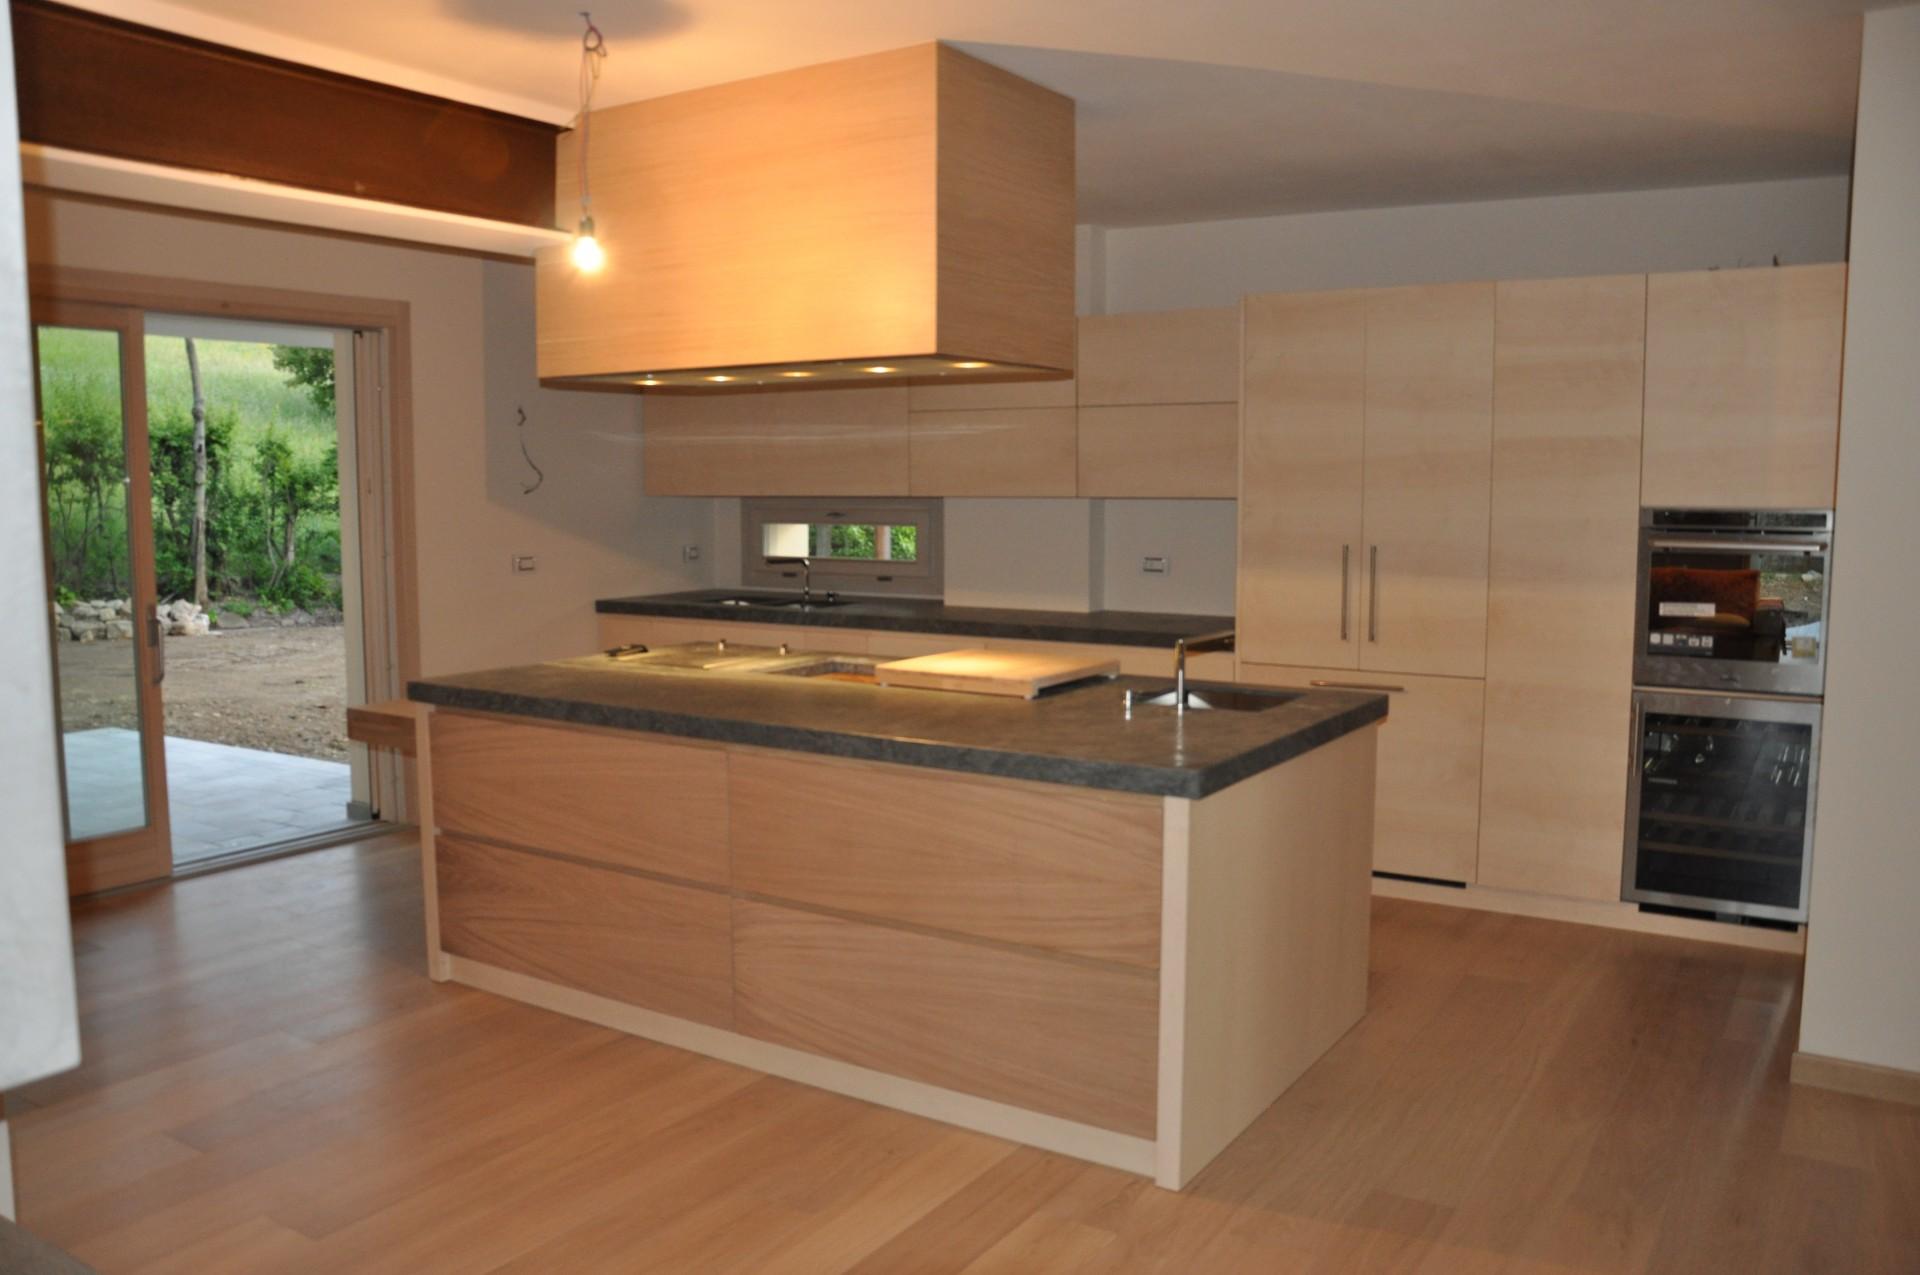 Cucine Moderne Cucine E Arredamenti Su Misura Cucine Country E #BD6B0E 1920 1275 Arredamento Cucine Moderne E Classiche